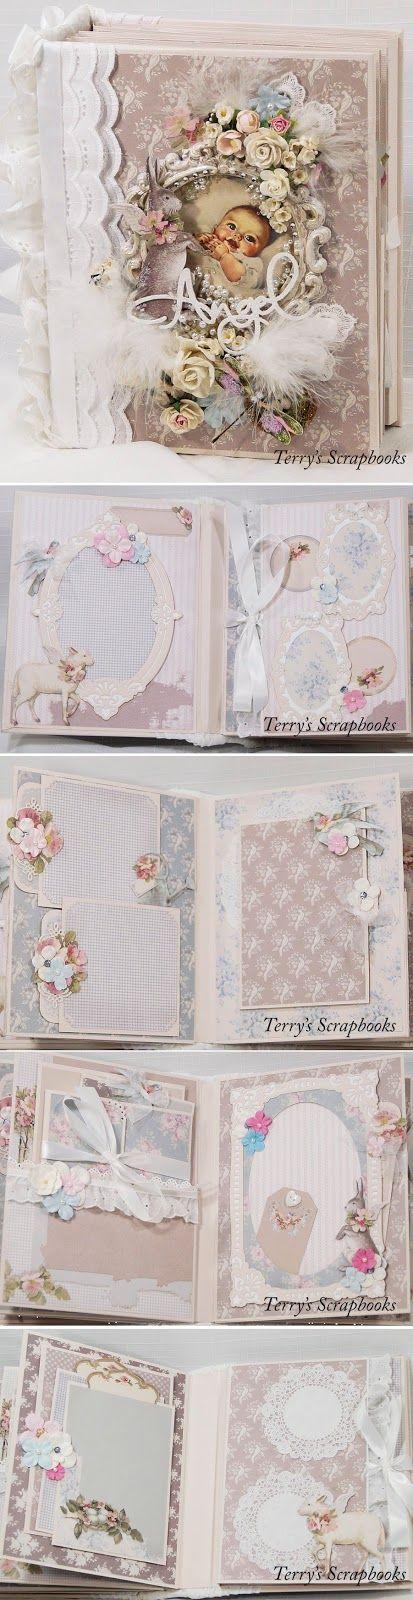 Terry's Scrapbooks: Tilda Baby Mini Album